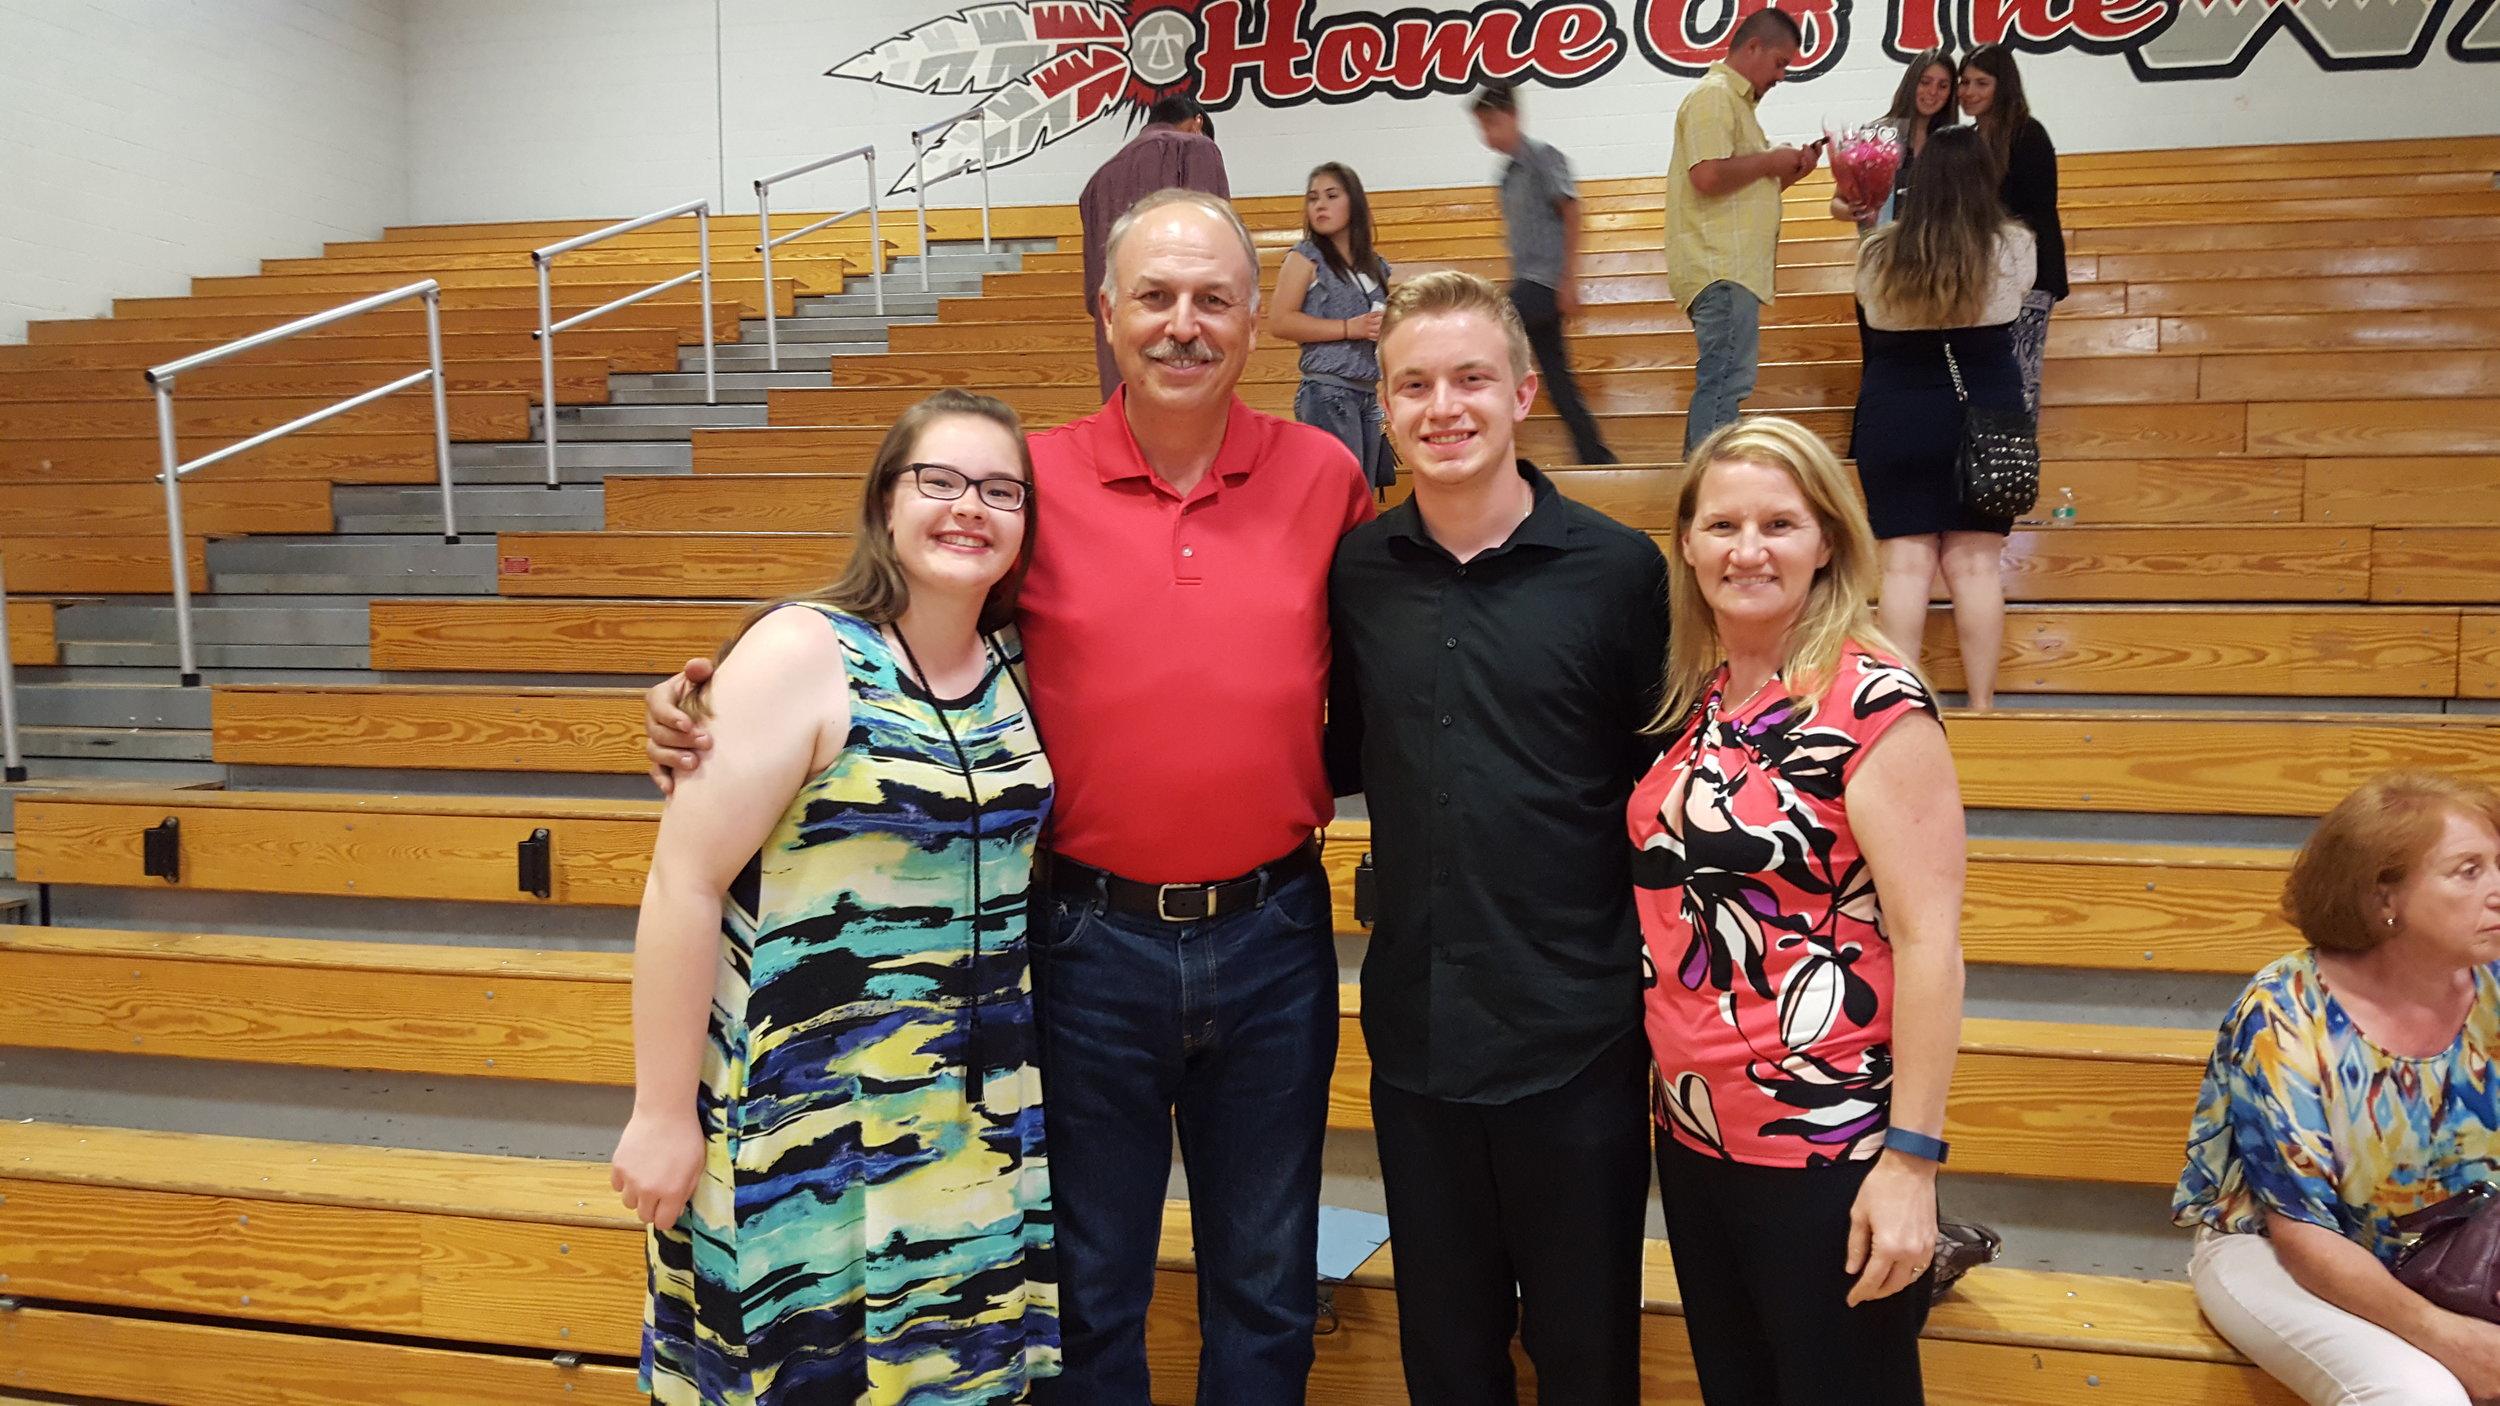 2017 Galt High School recipients